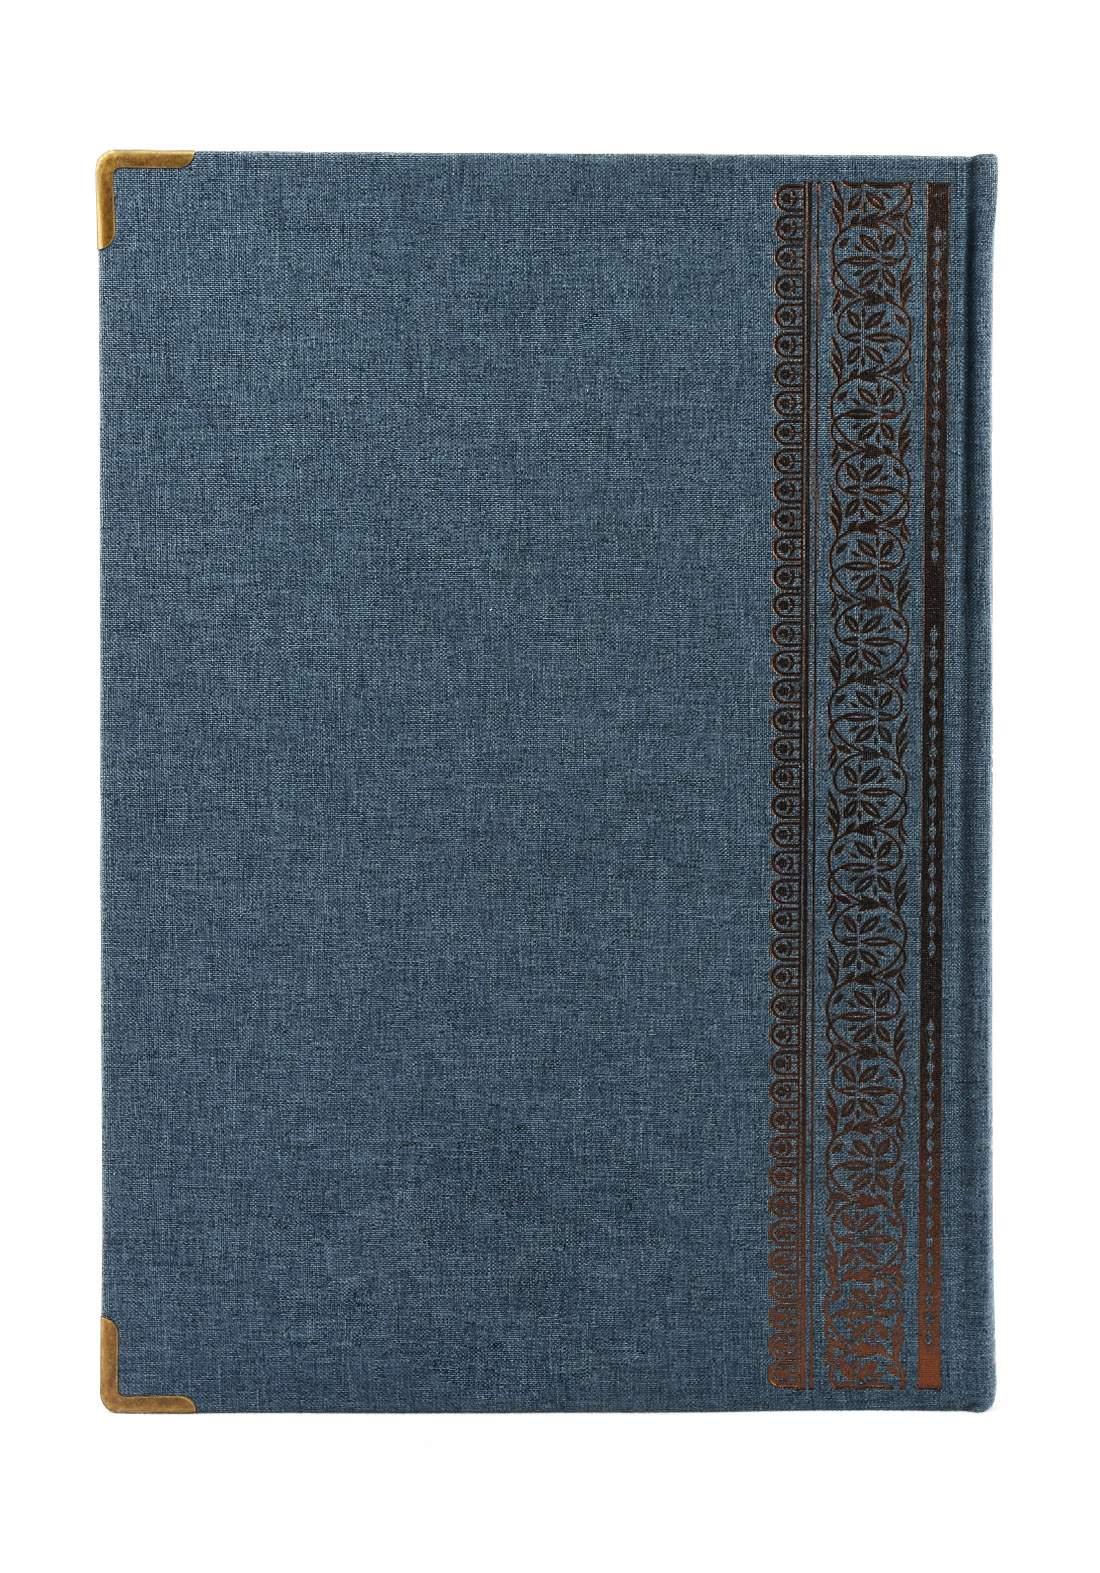 Tarsi (1438-2007 ) 160 Sheets Drawing Book دفتر رسم تارسي 160ورقة